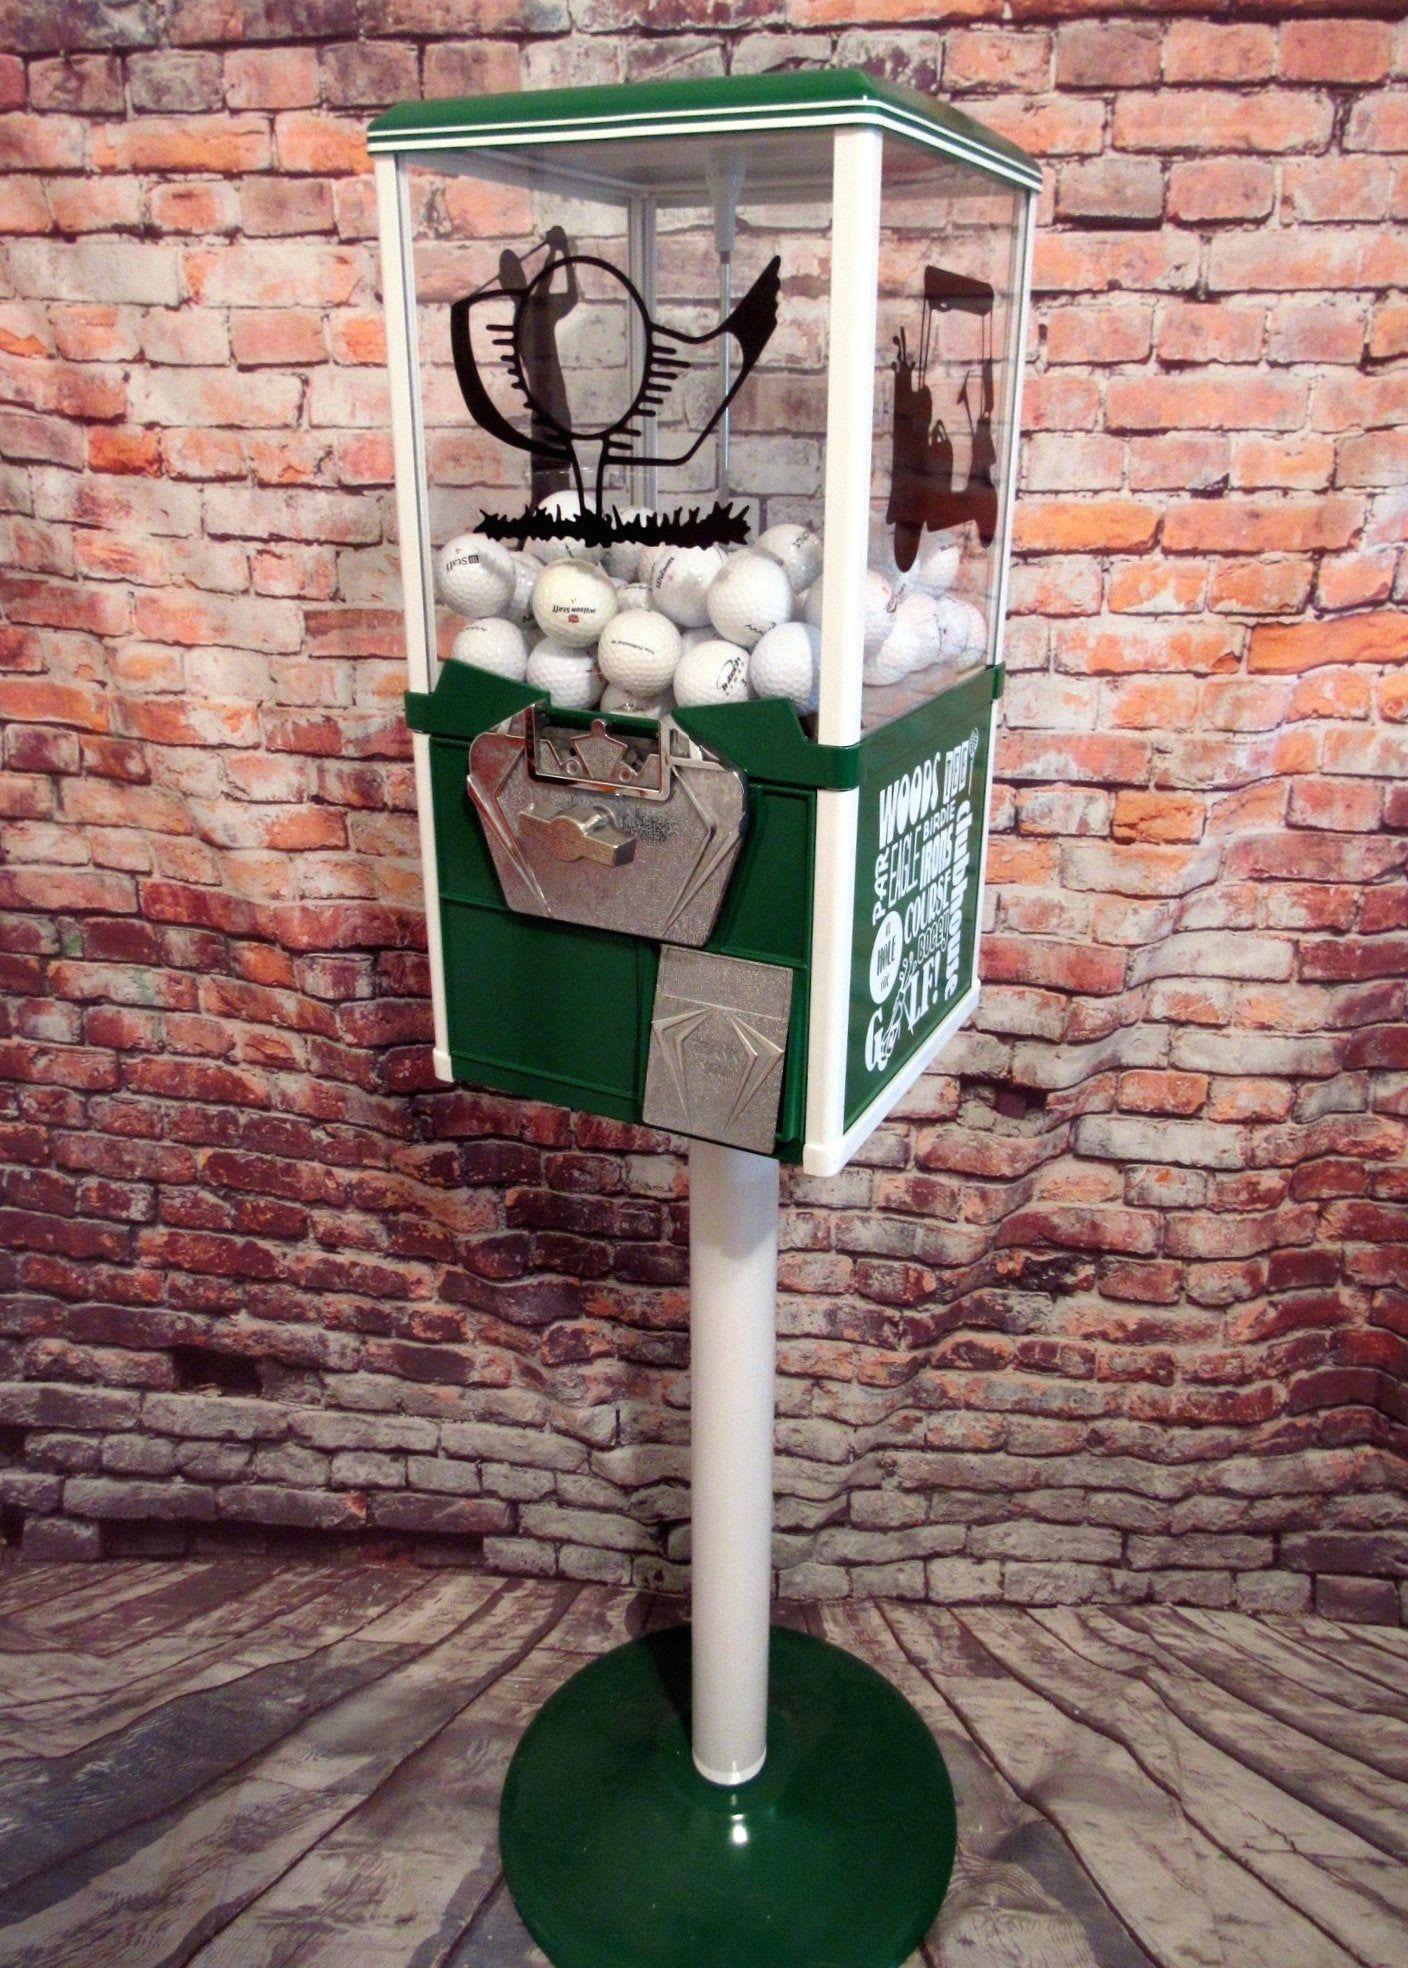 Golf ball vending machine man cave gift home decor golf